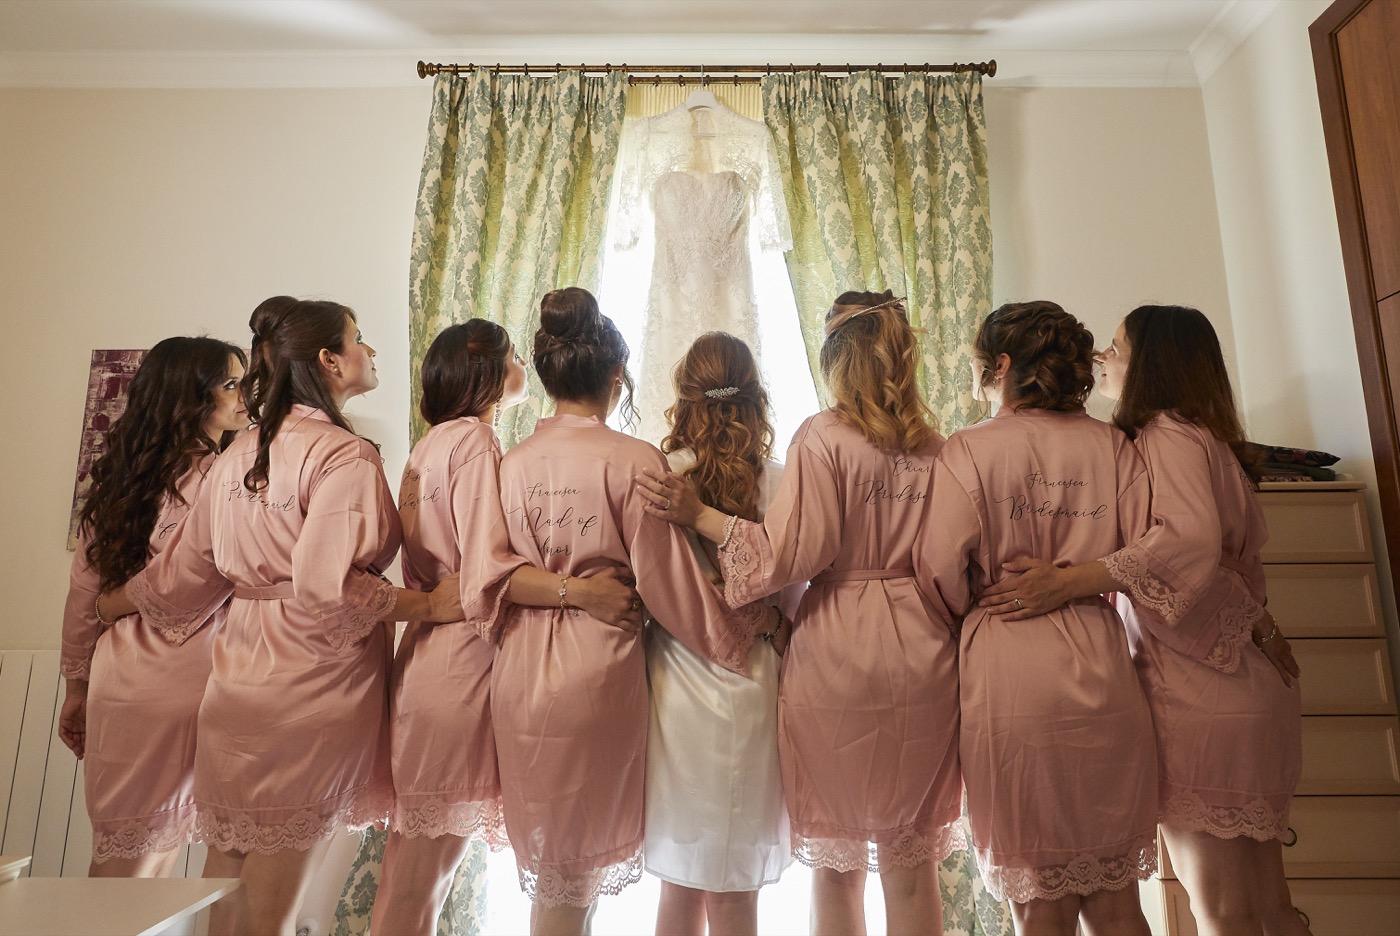 Claudio-Coppola-wedding-photographer-abbazia-7-frati-piegaro-27